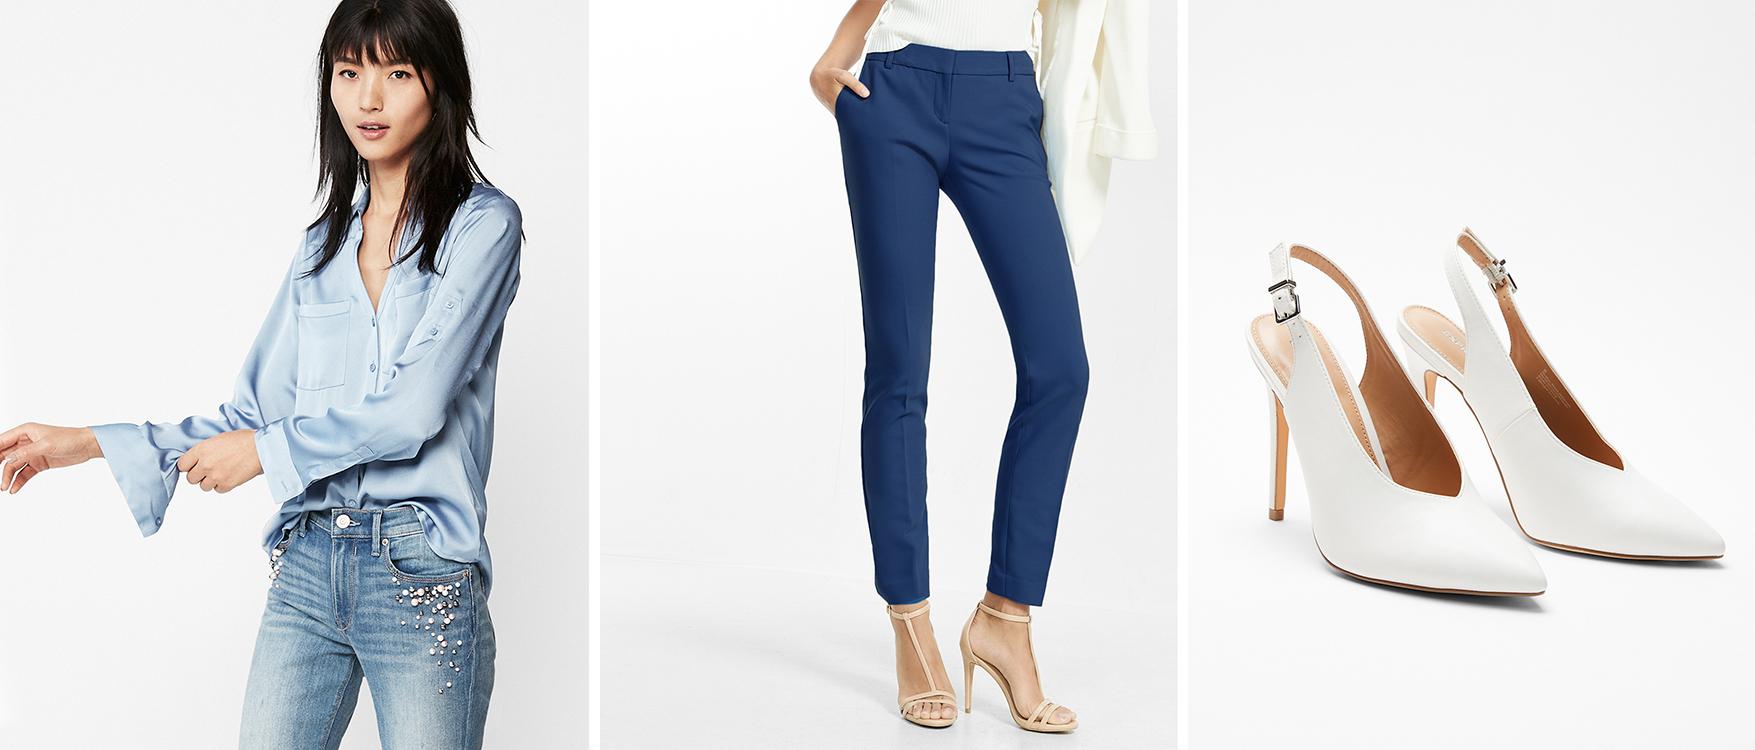 mid-rise-ankle-pant-portofino-shirt-high-heels